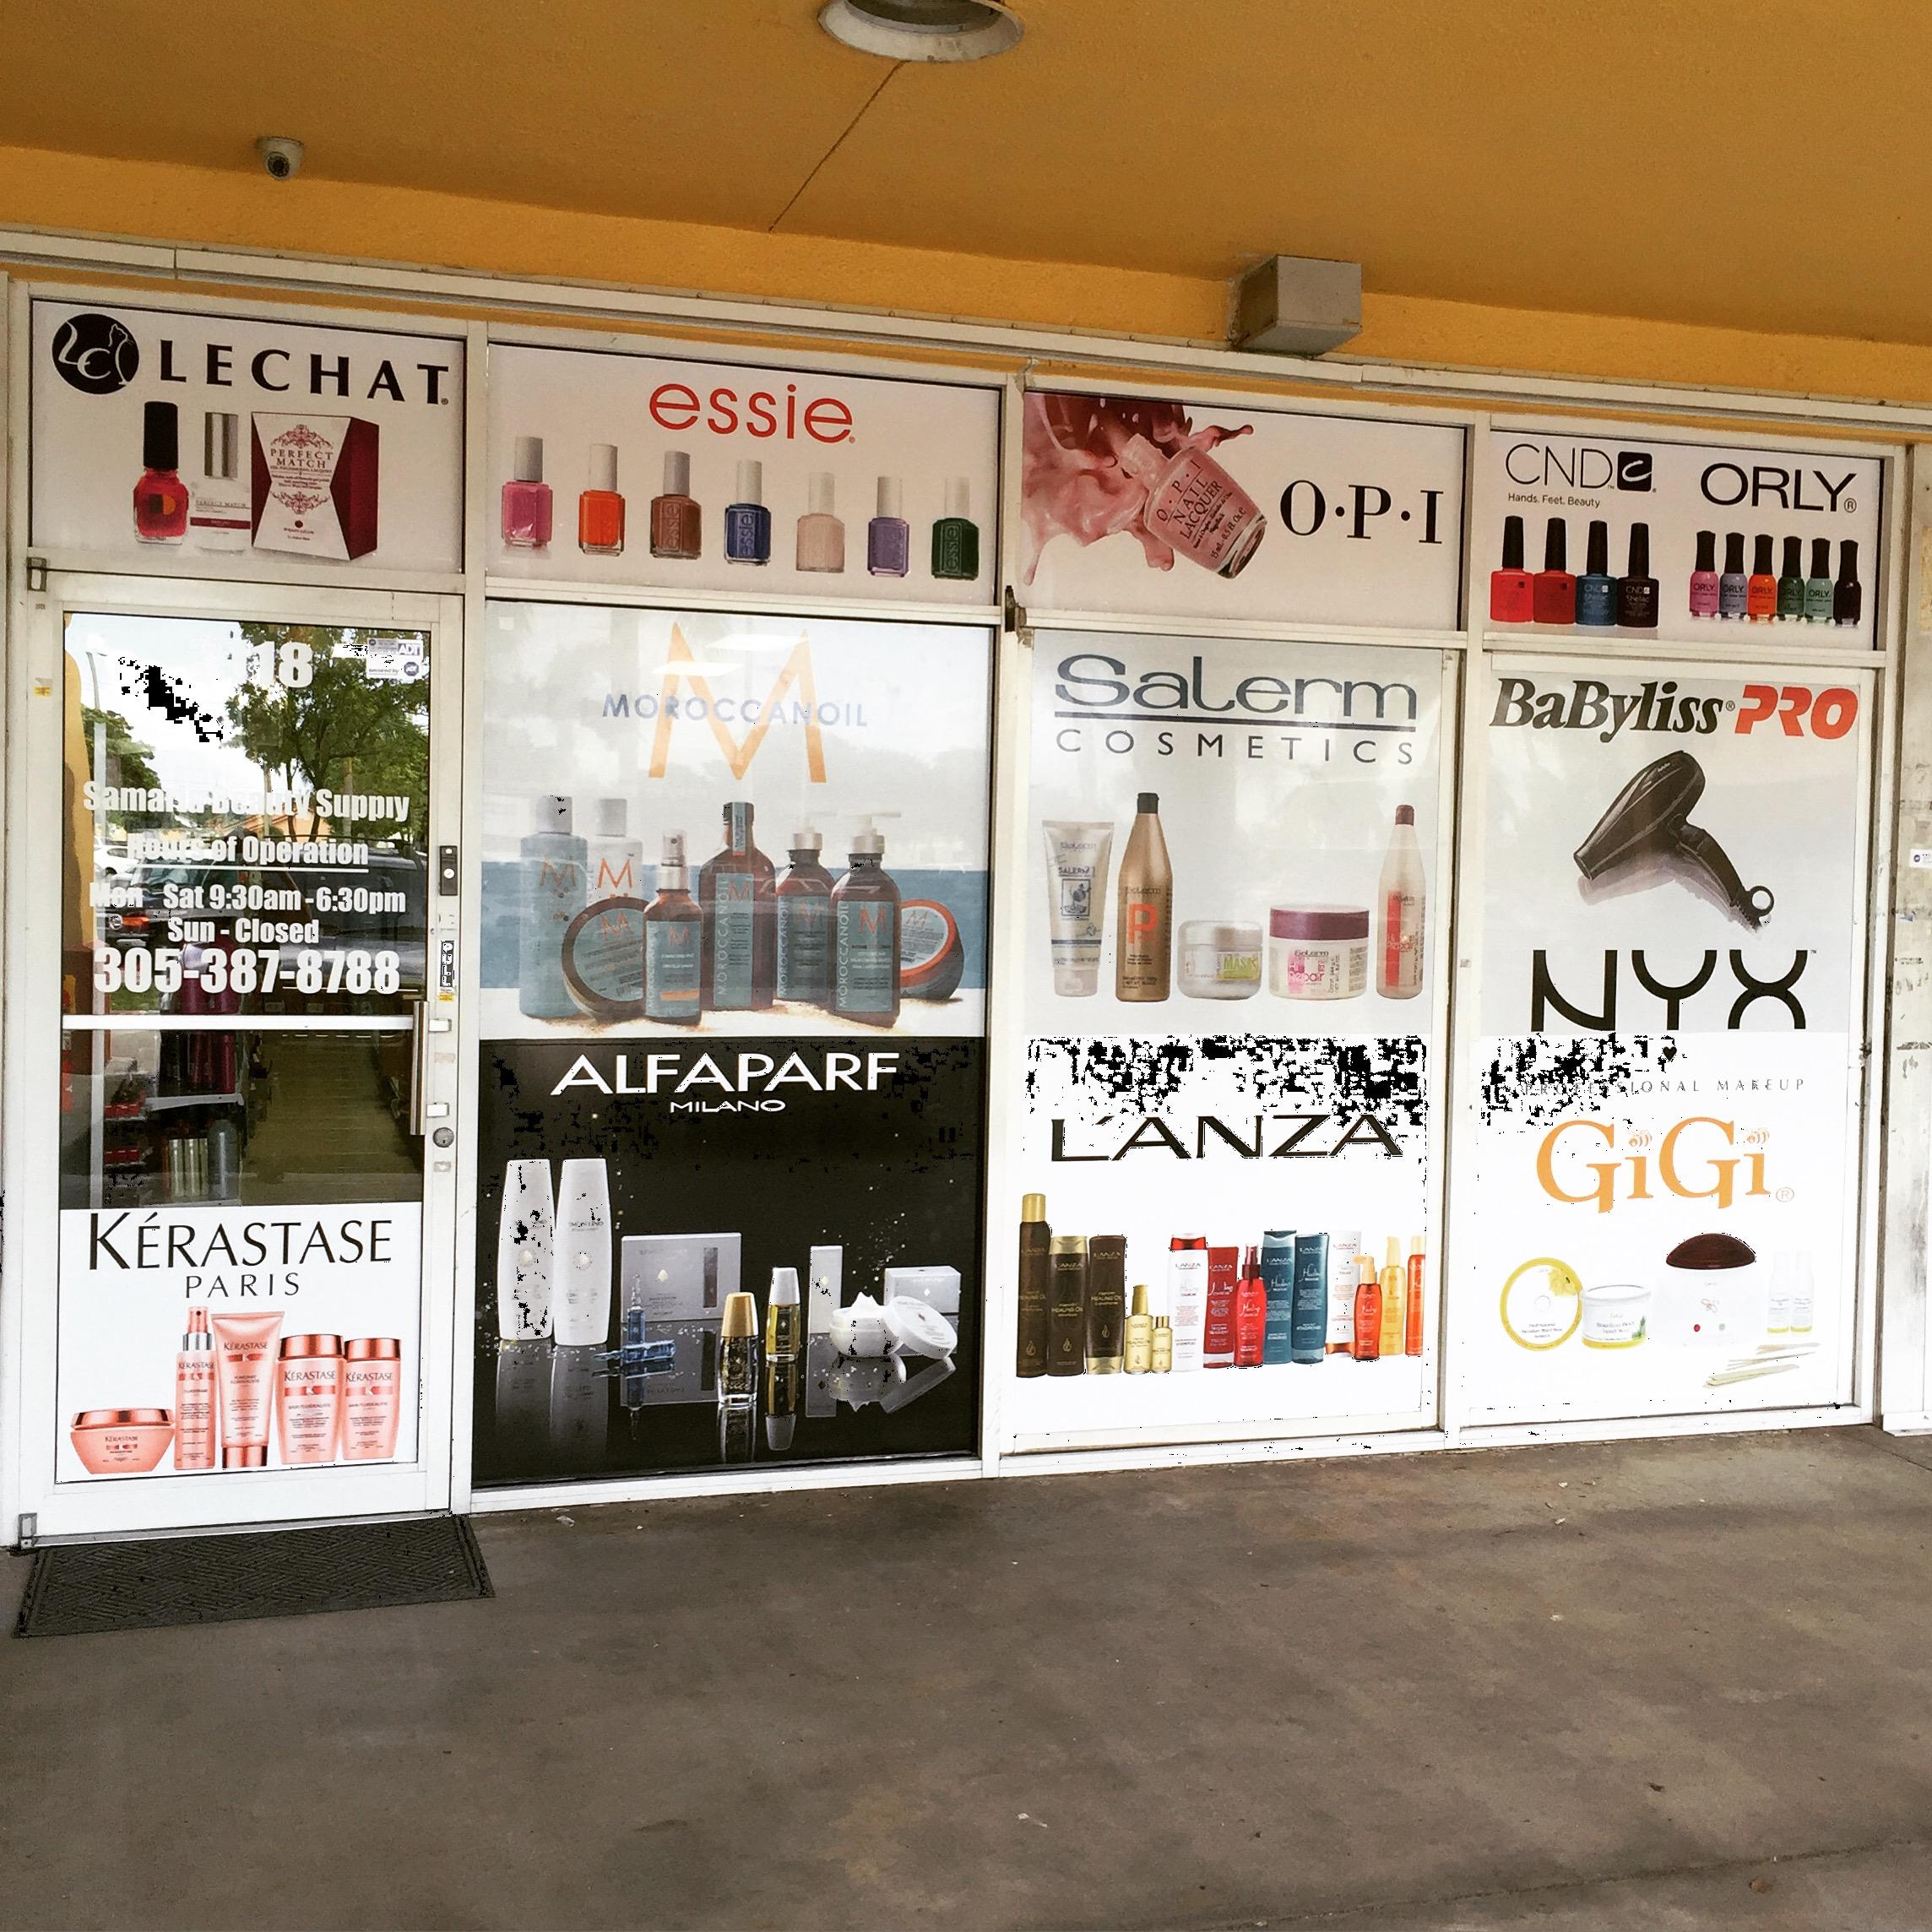 Samaria Beauty Supply Store 3118 W 76th St Hialeah Fl